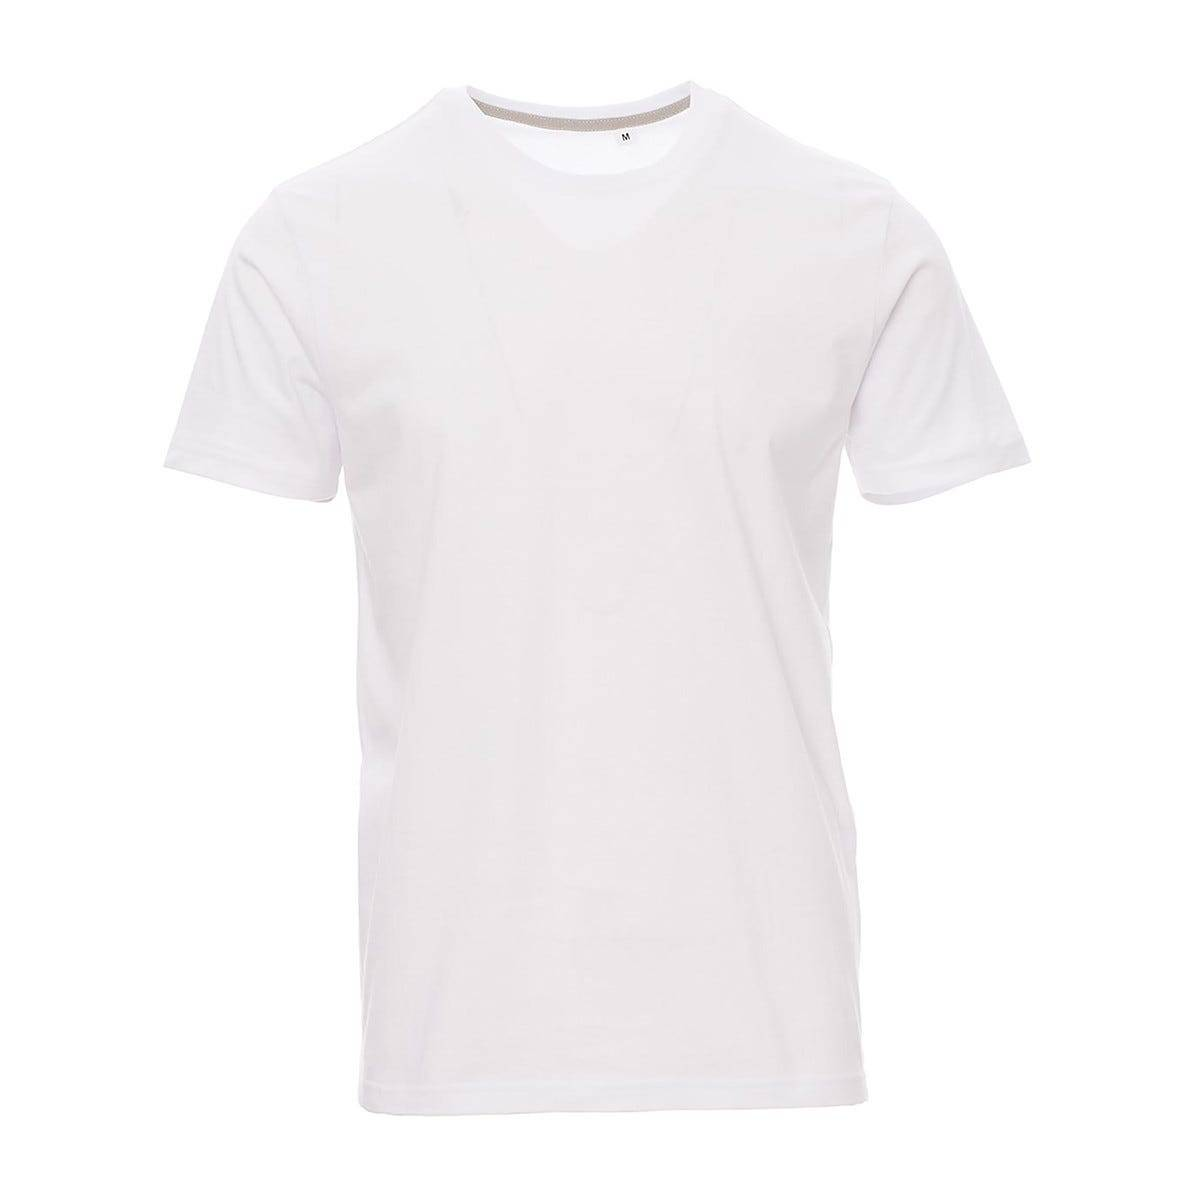 5 T Shirt Manica Corta Taglia Xl Bianco 100% Cotone